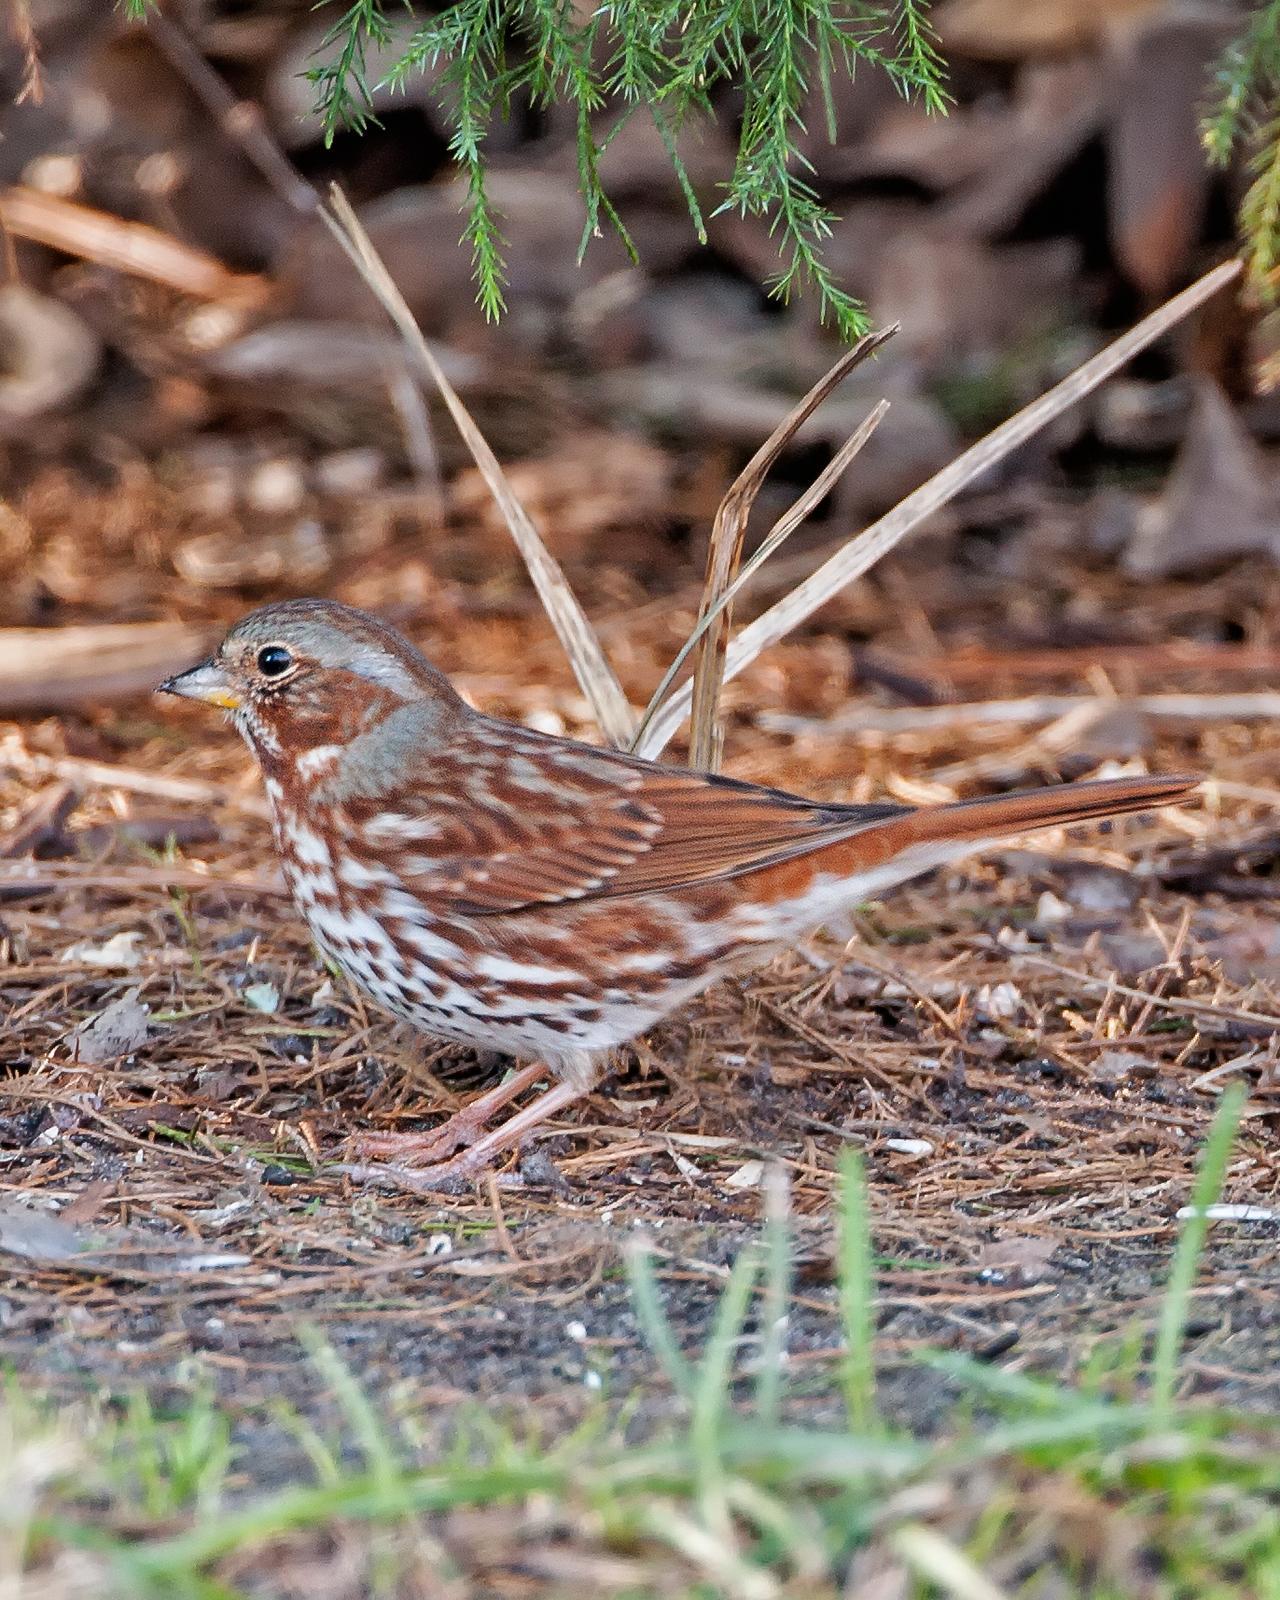 Fox Sparrow Photo by JC Knoll